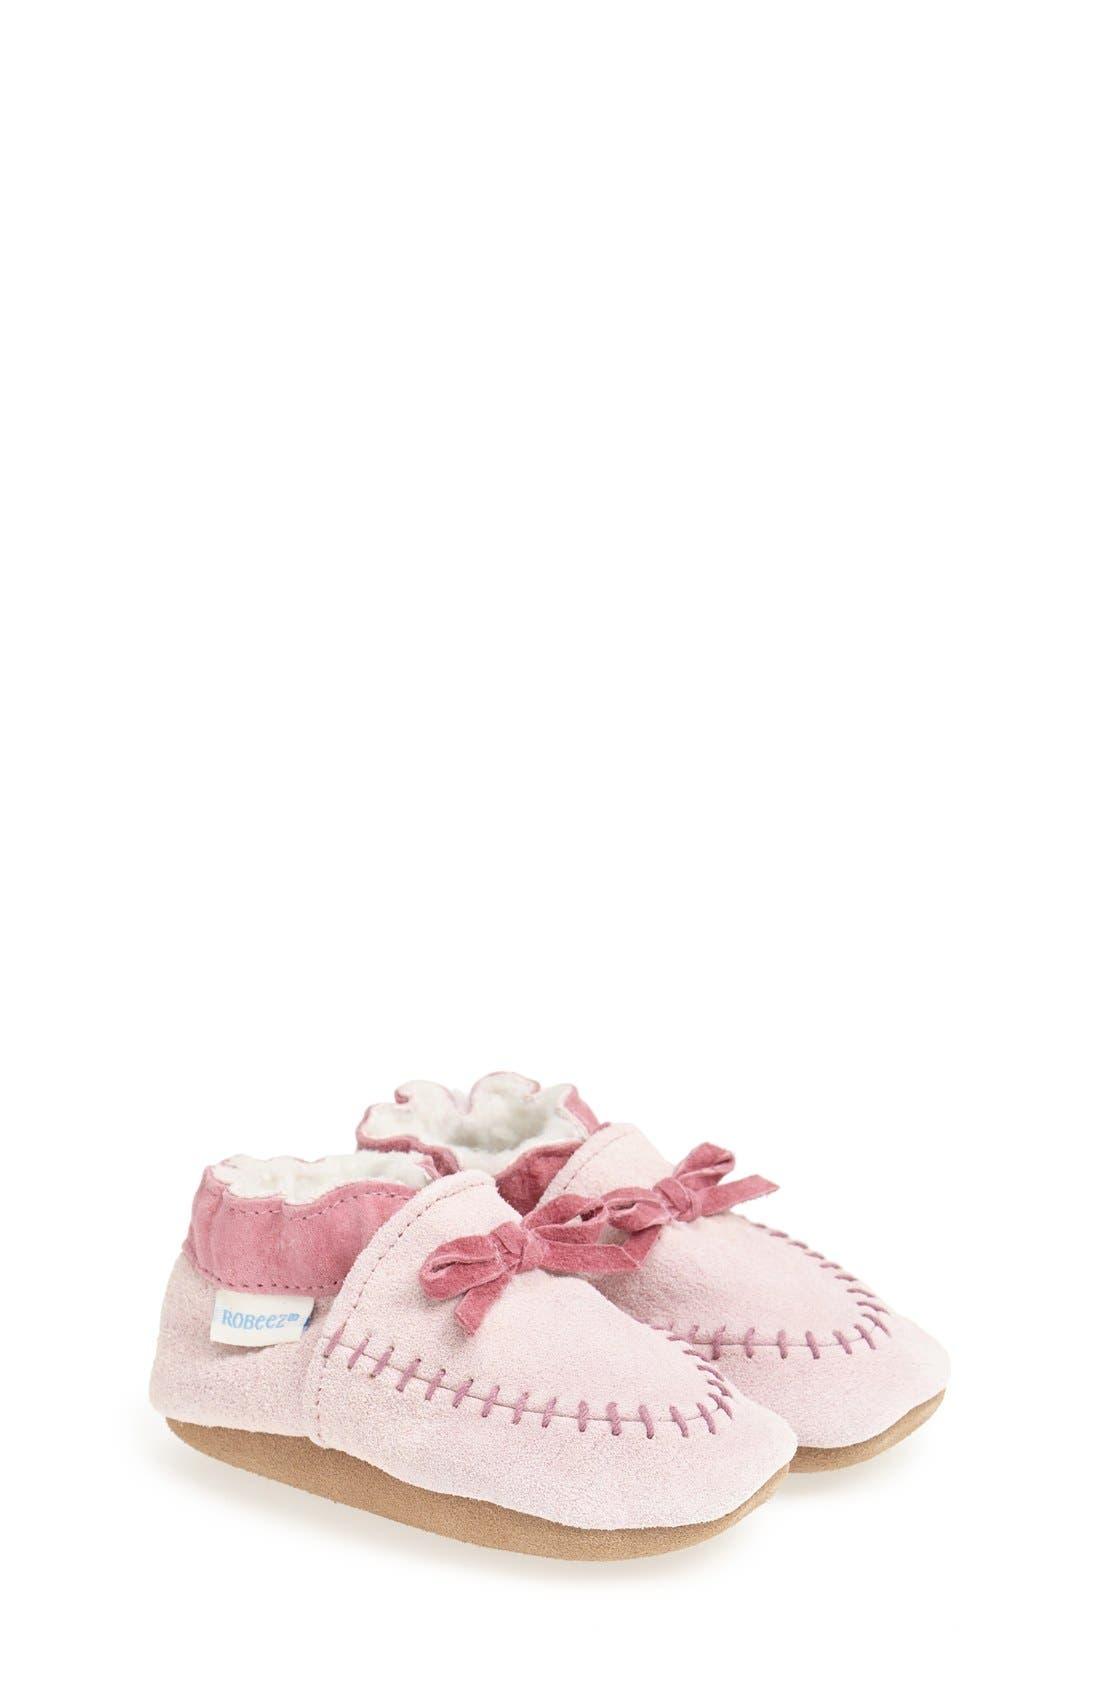 Main Image - Robeez® Cozy Moccasin Crib Shoe (Baby & Walker)